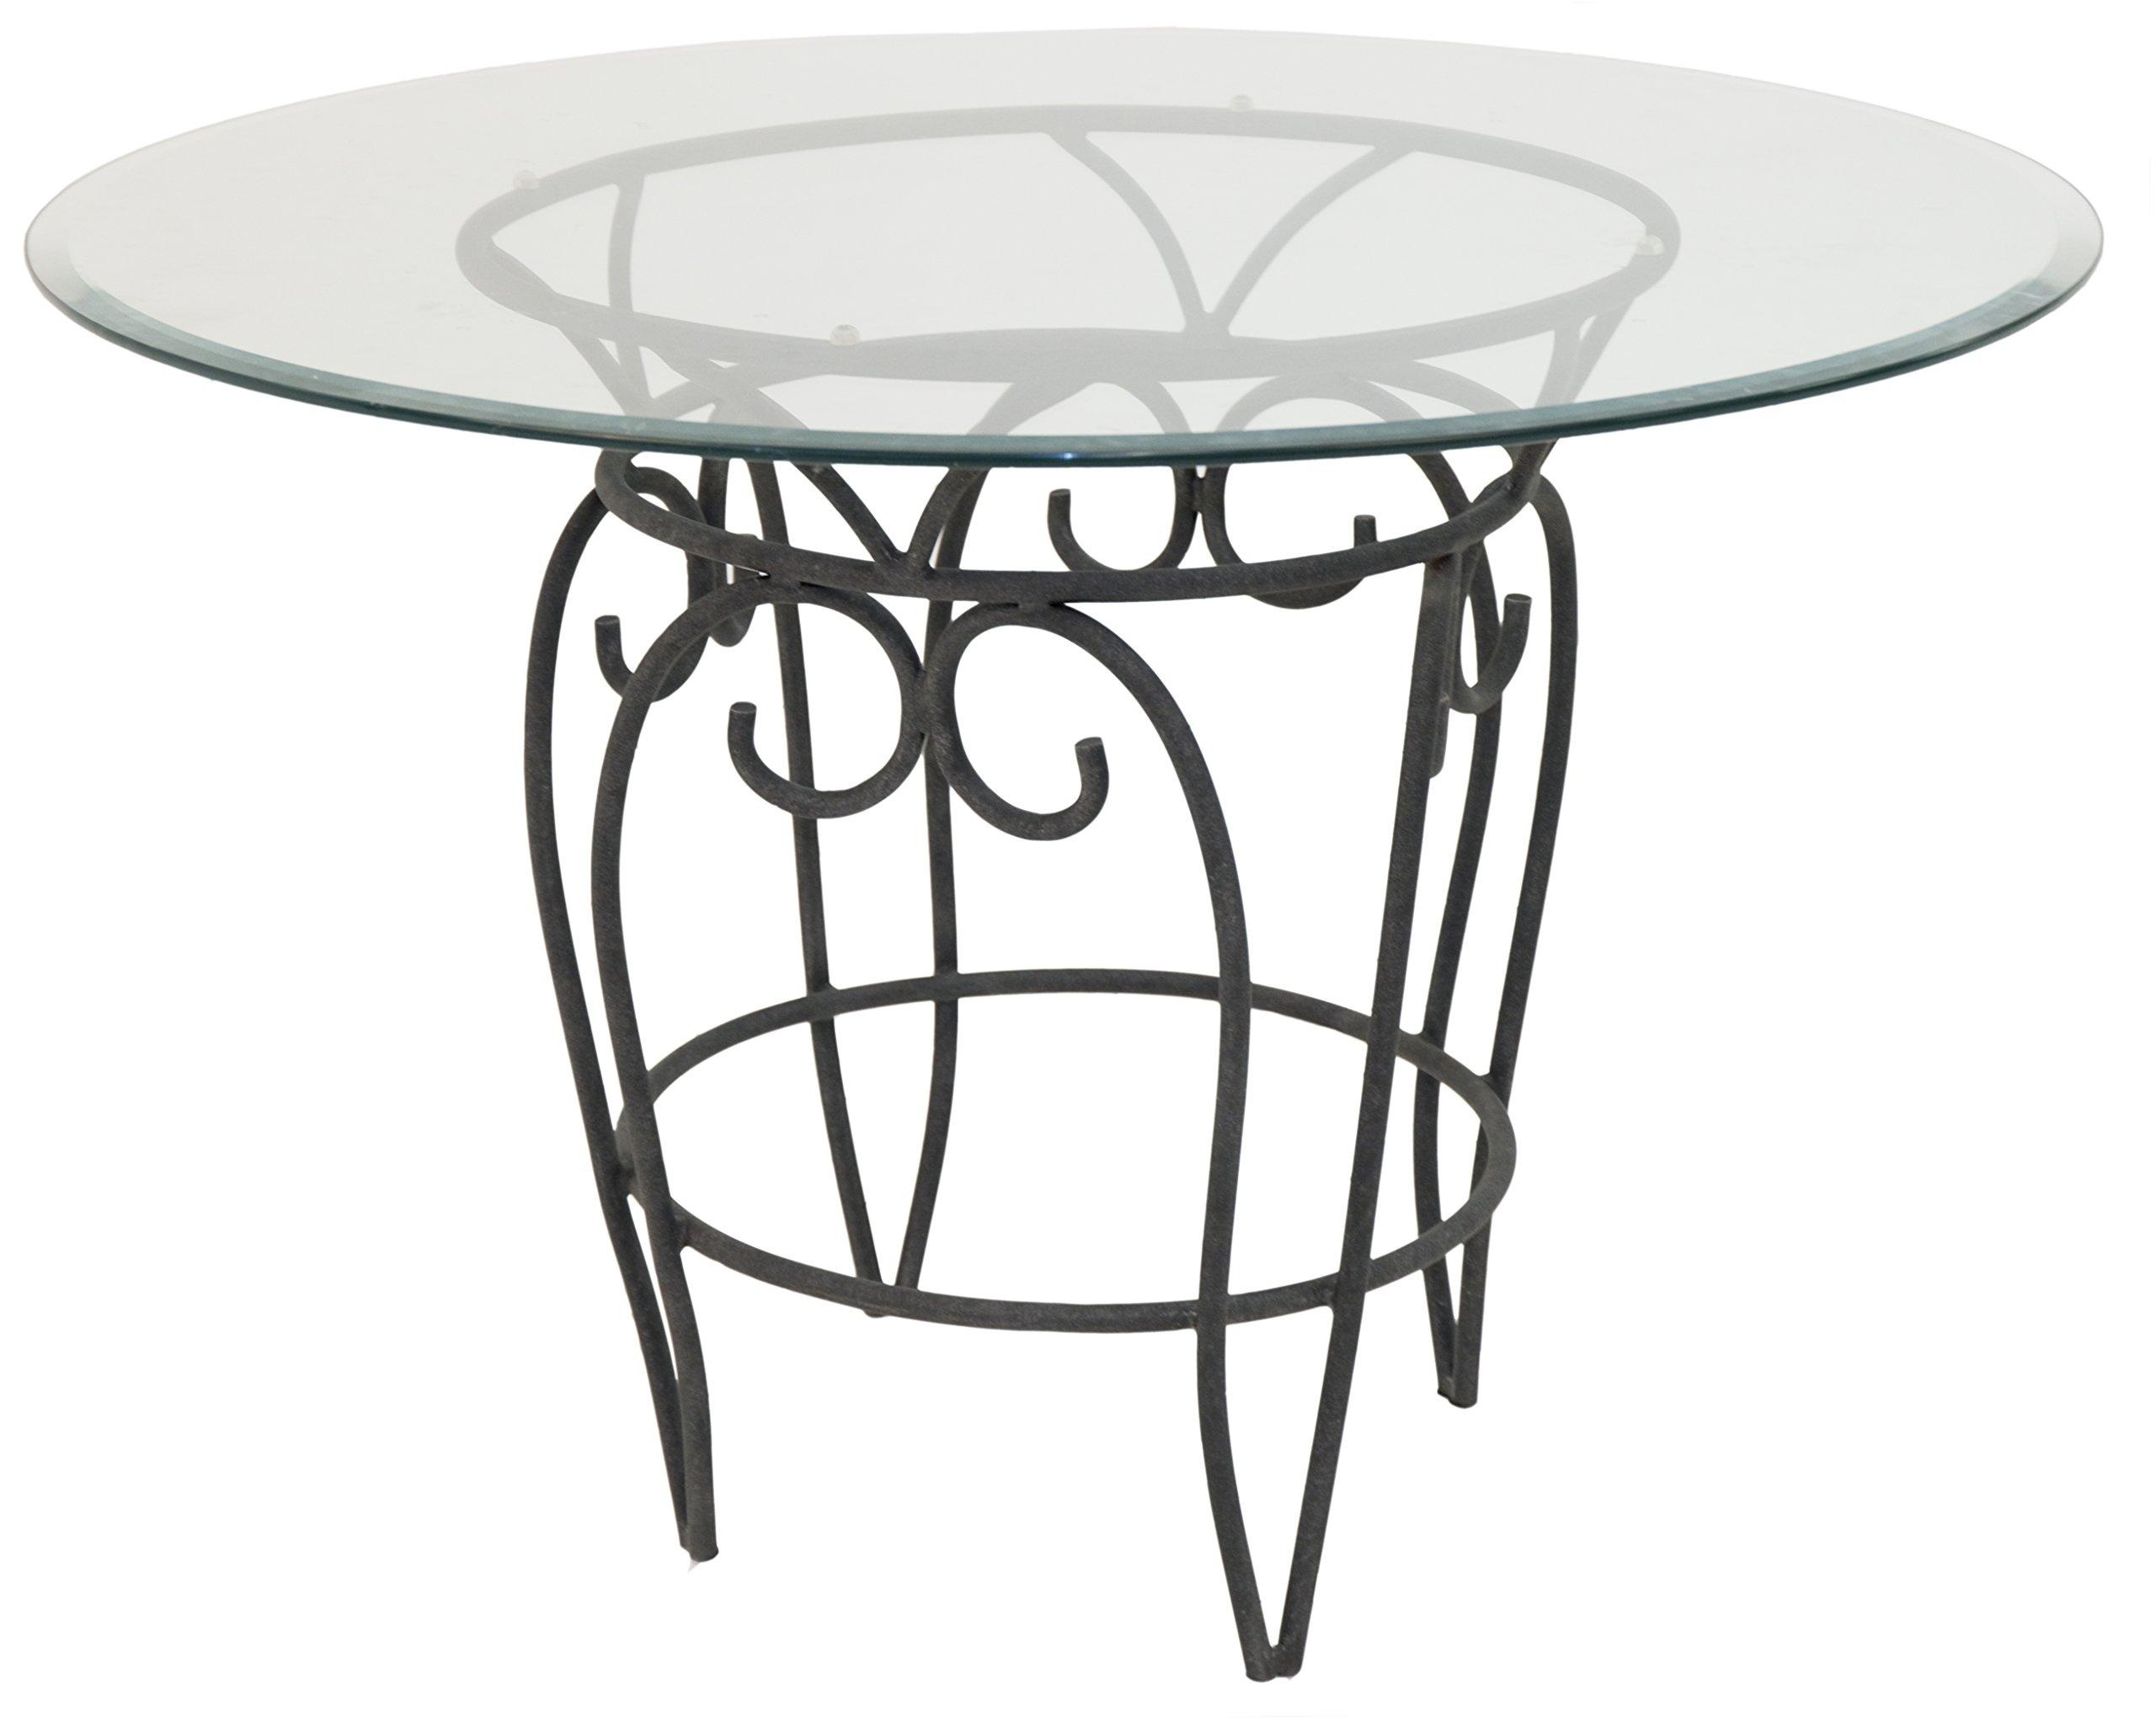 Impacterra Solar Dining Table, 42'' Diameter, Midnight Platinum/Clear Glass